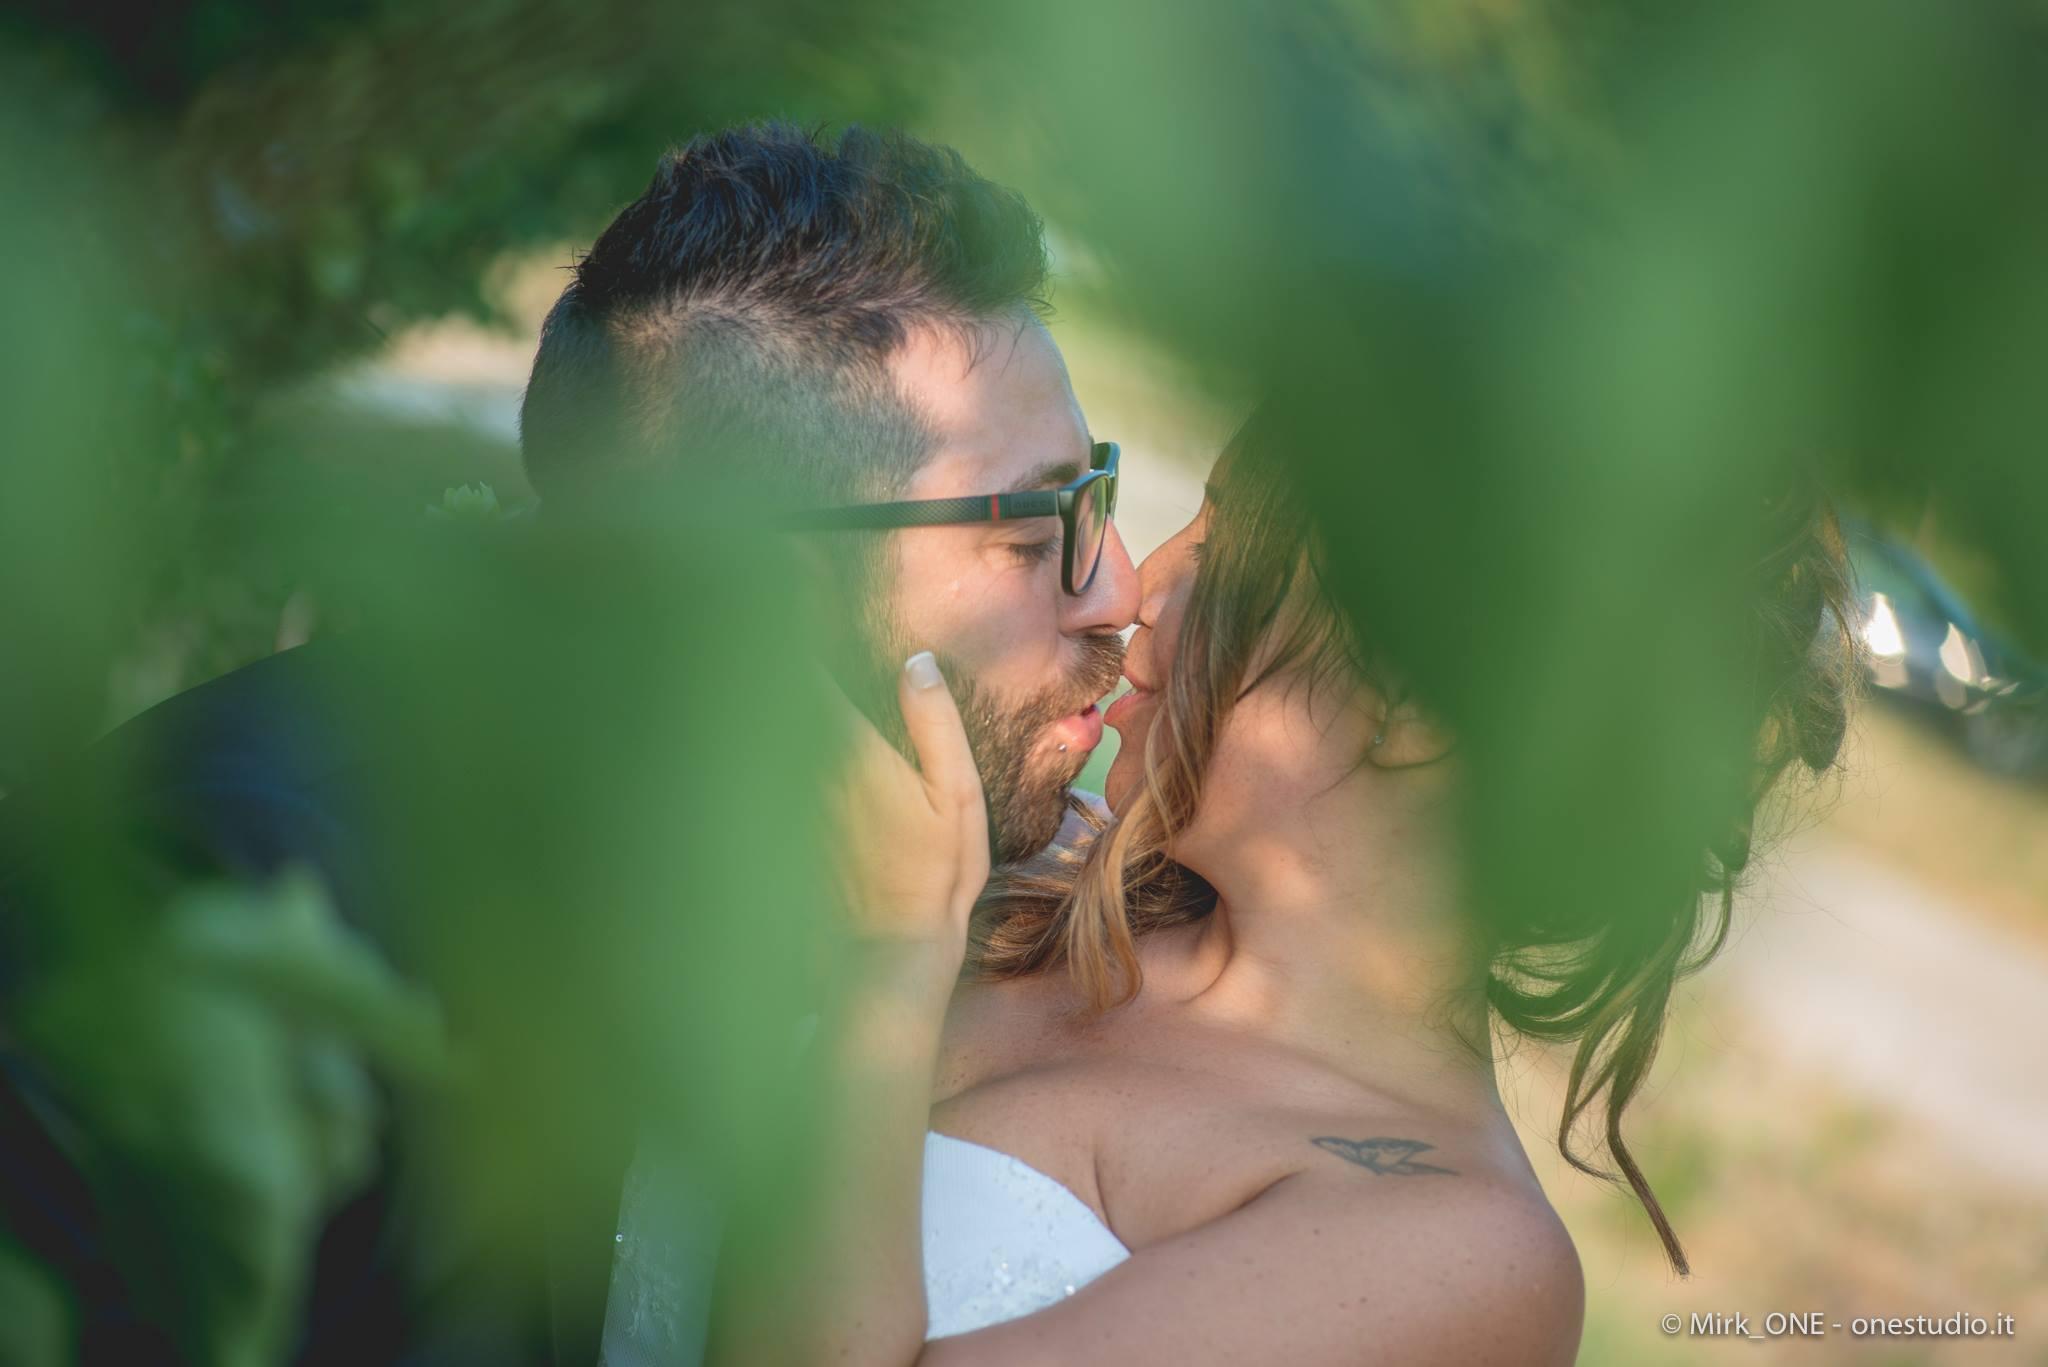 https://lnx.mirkone.it/wp-content/uploads/2015/07/mirk_ONE-fotografo-matrimonio-00822.jpg